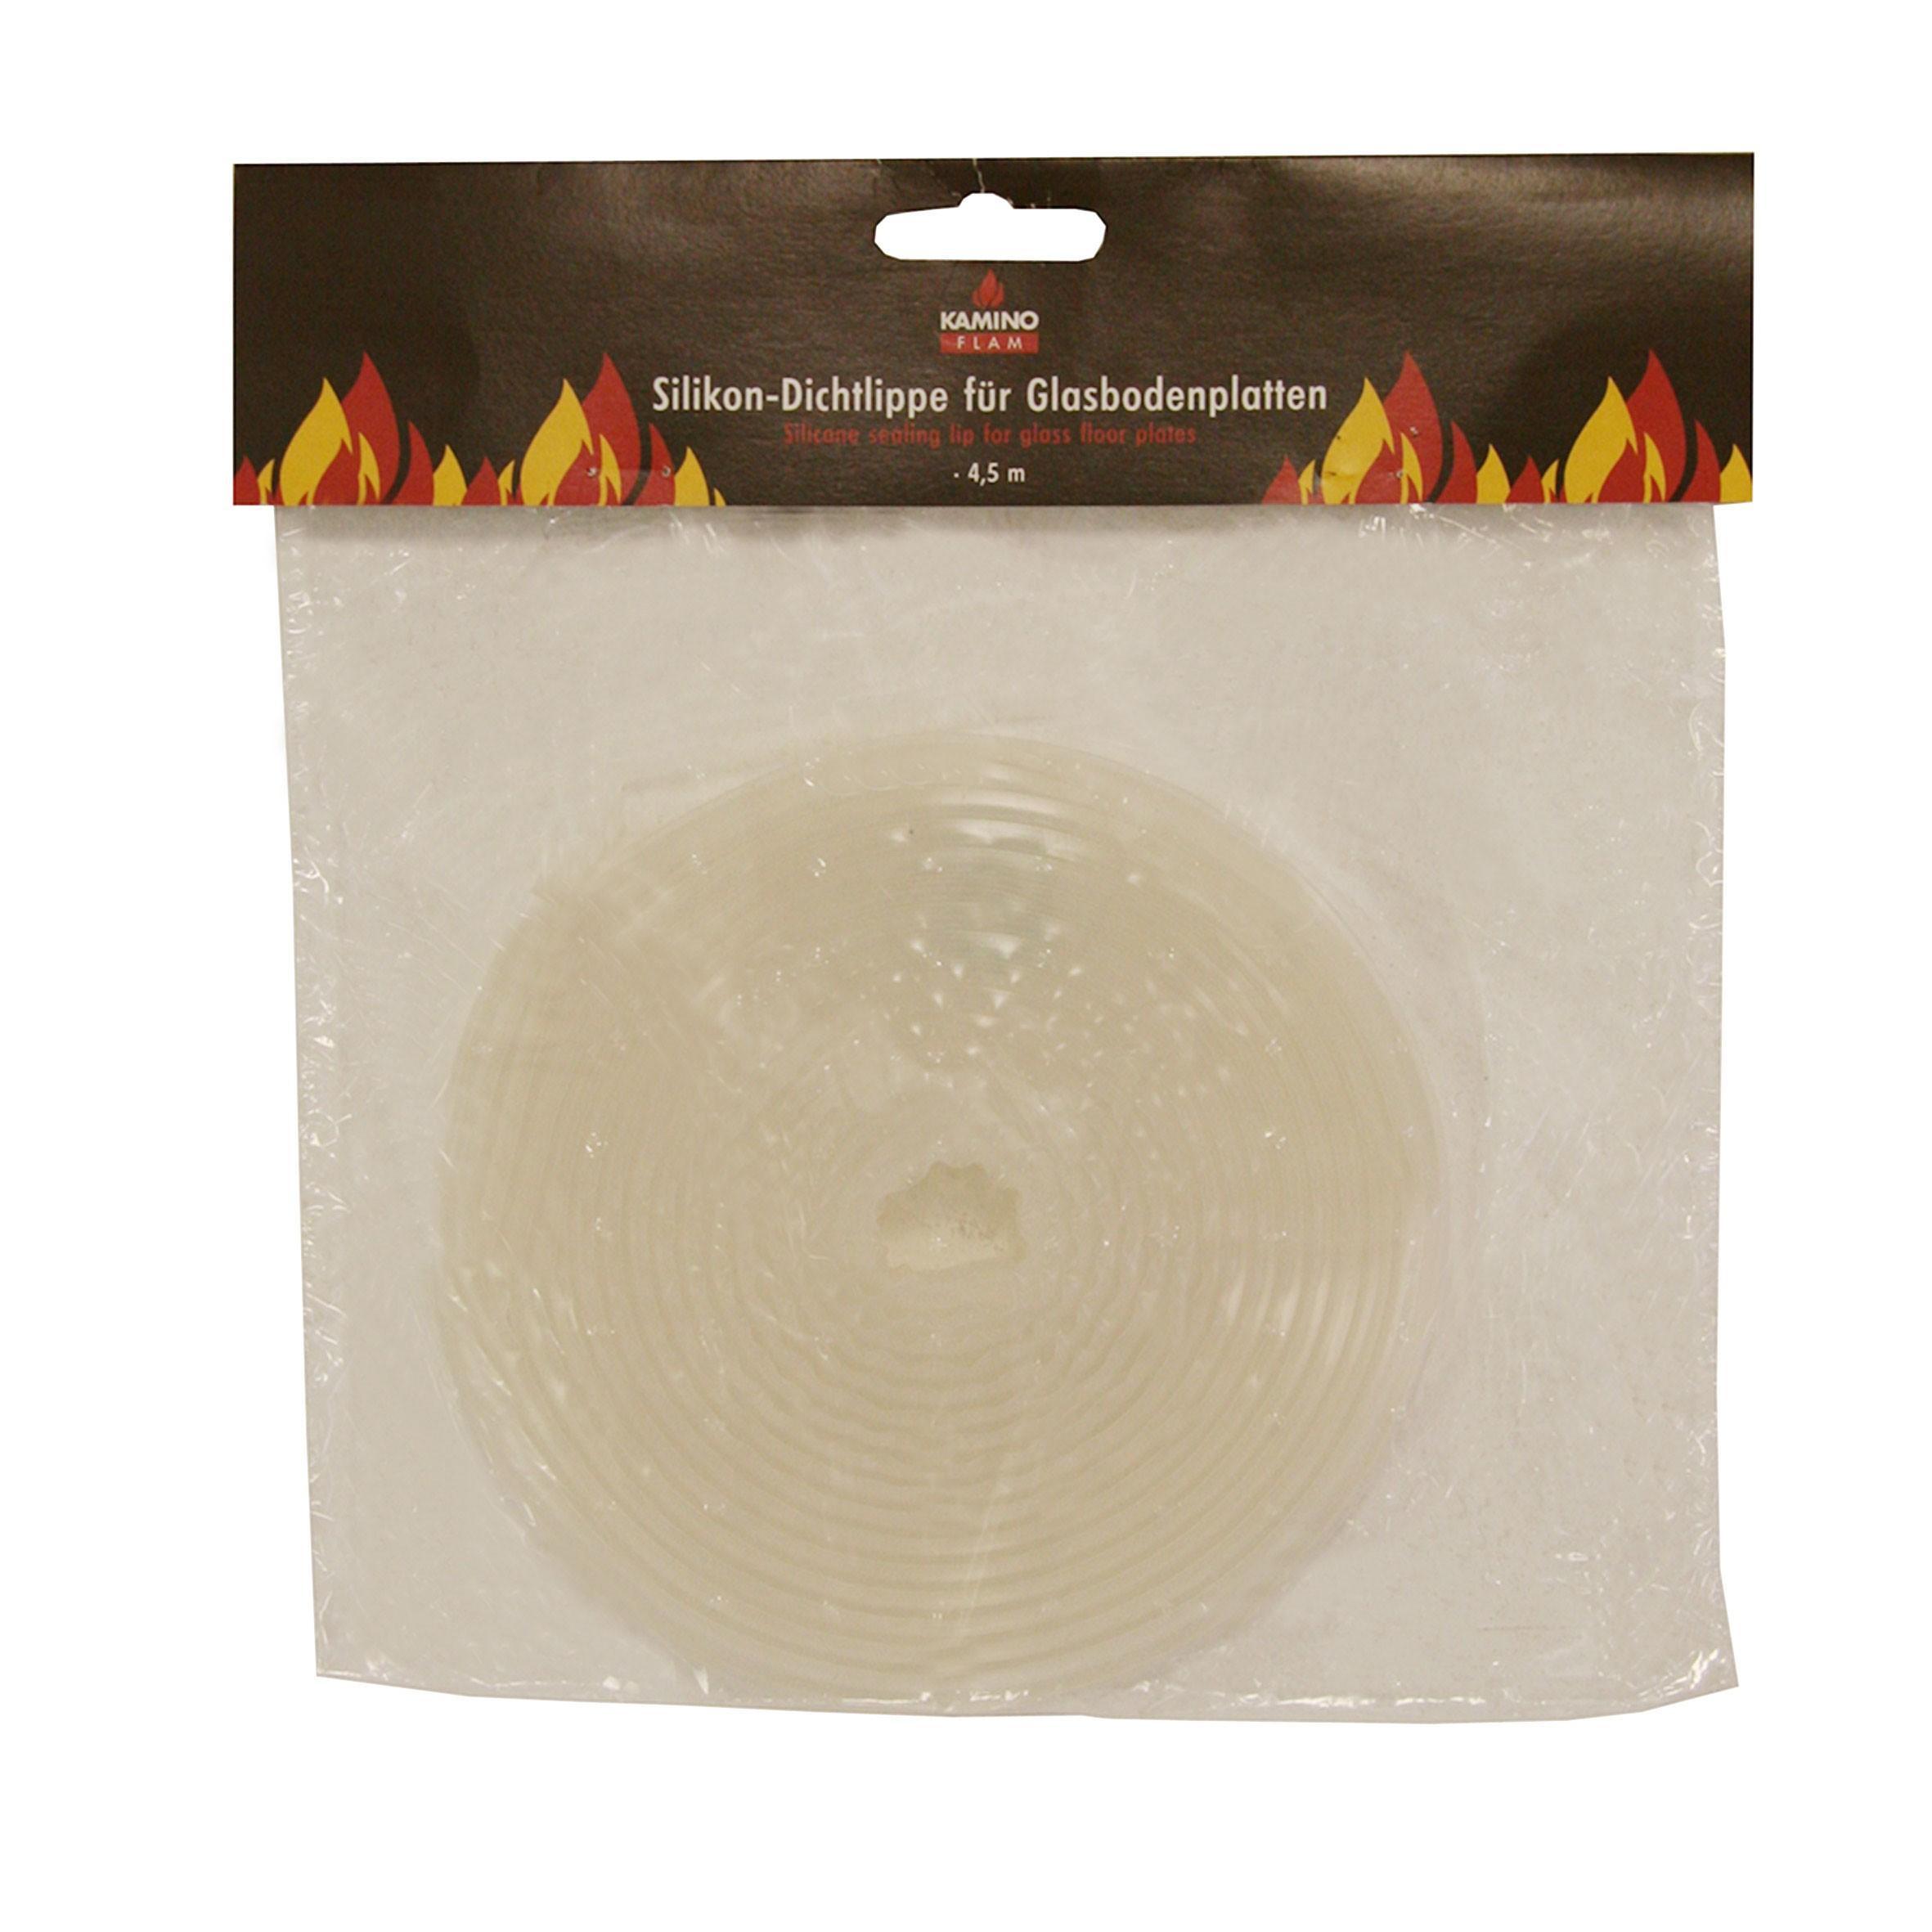 Beliebt Schmutzlippe KaminoFlam zu Funkenschutzplatten / Glasbodenplatten RH63